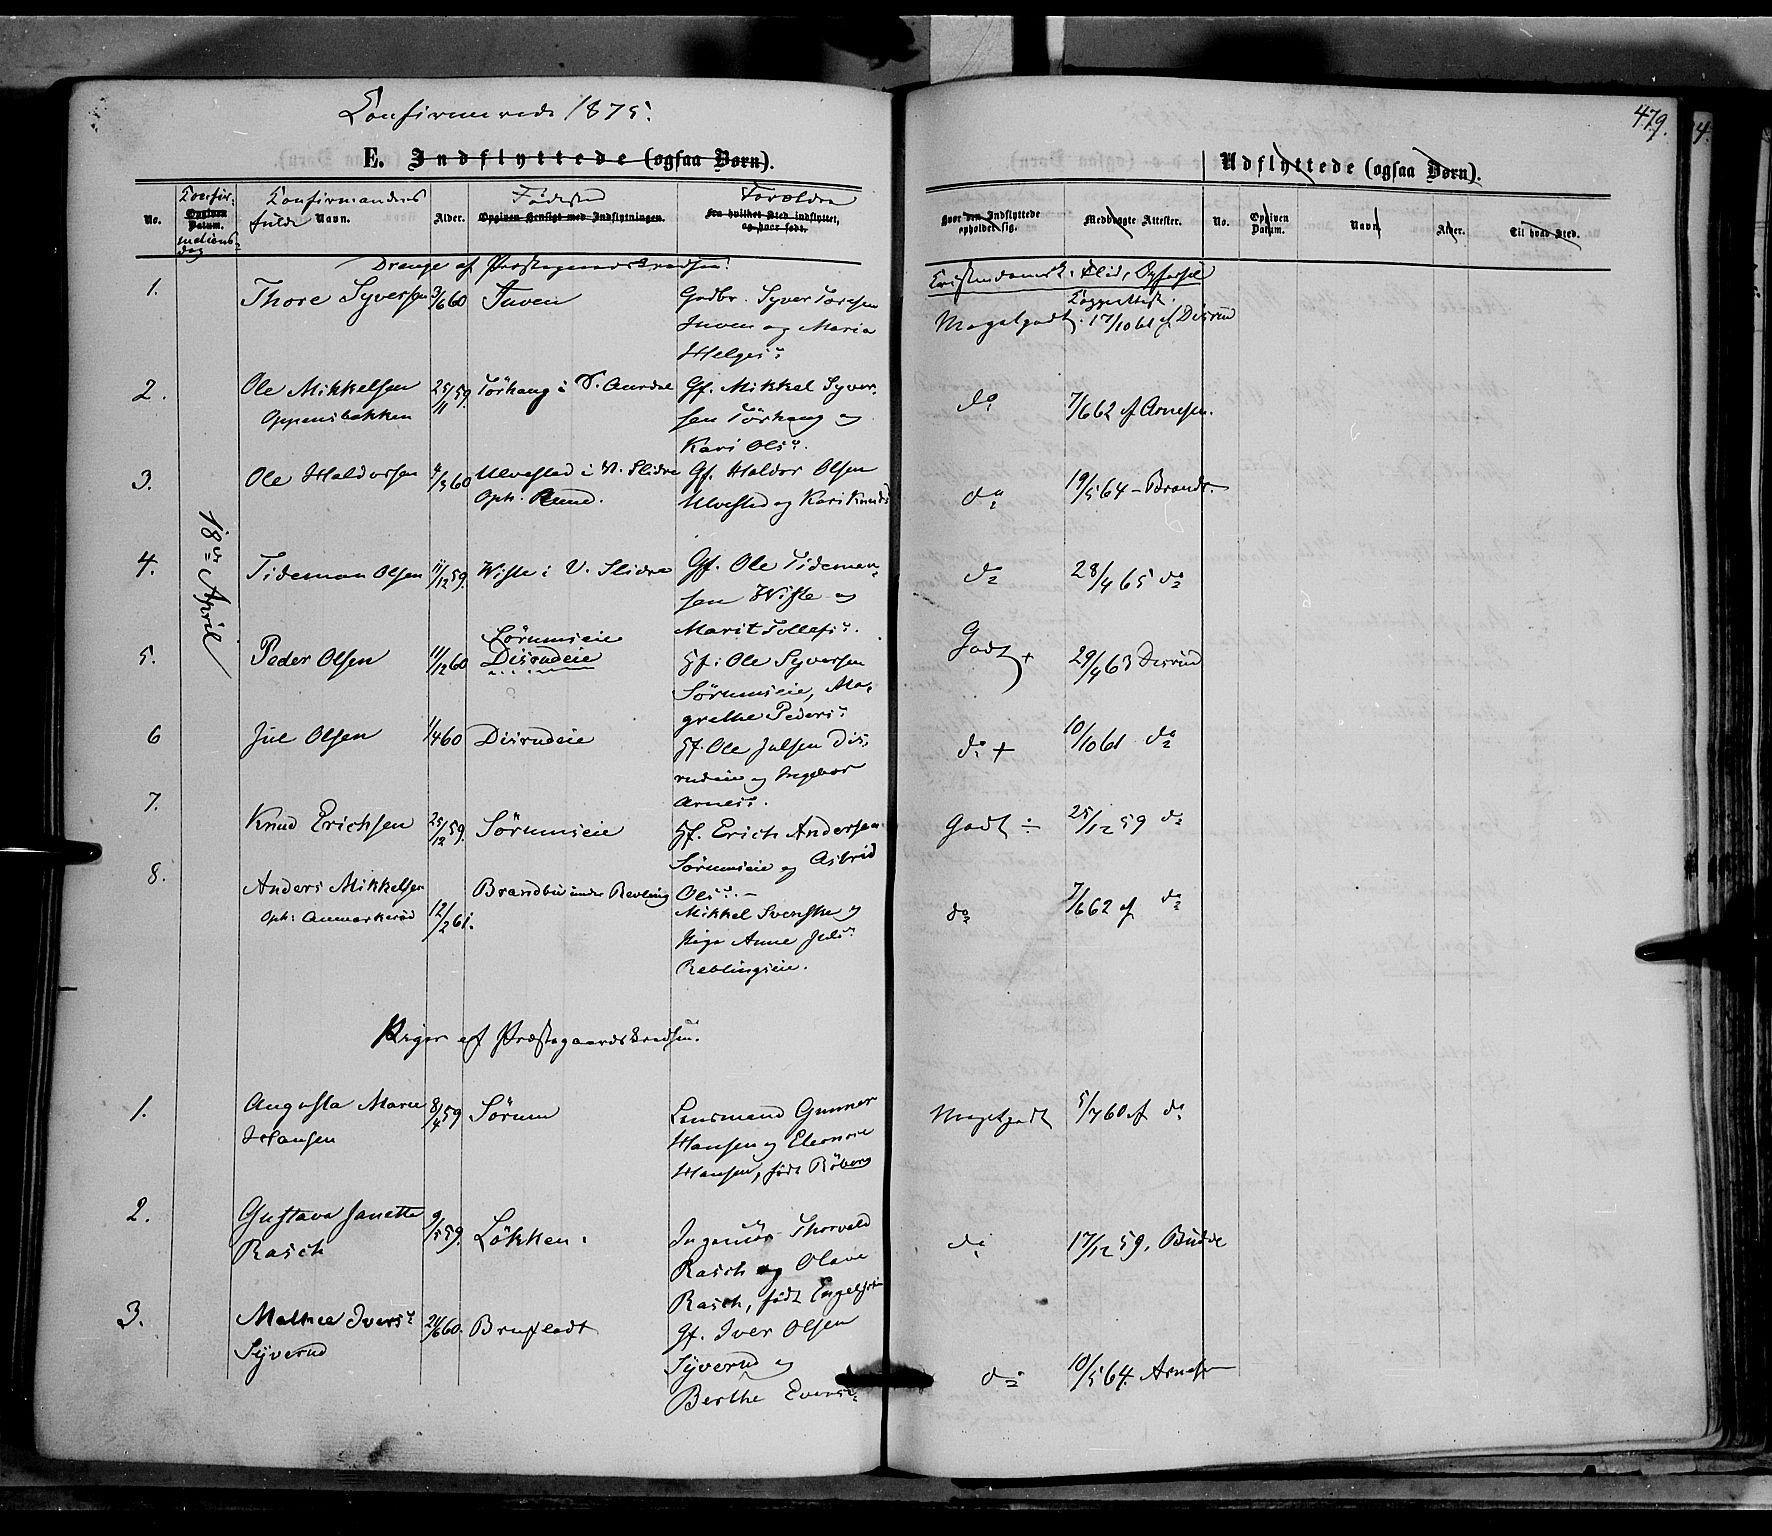 SAH, Nord-Aurdal prestekontor, Ministerialbok nr. 8, 1863-1875, s. 479